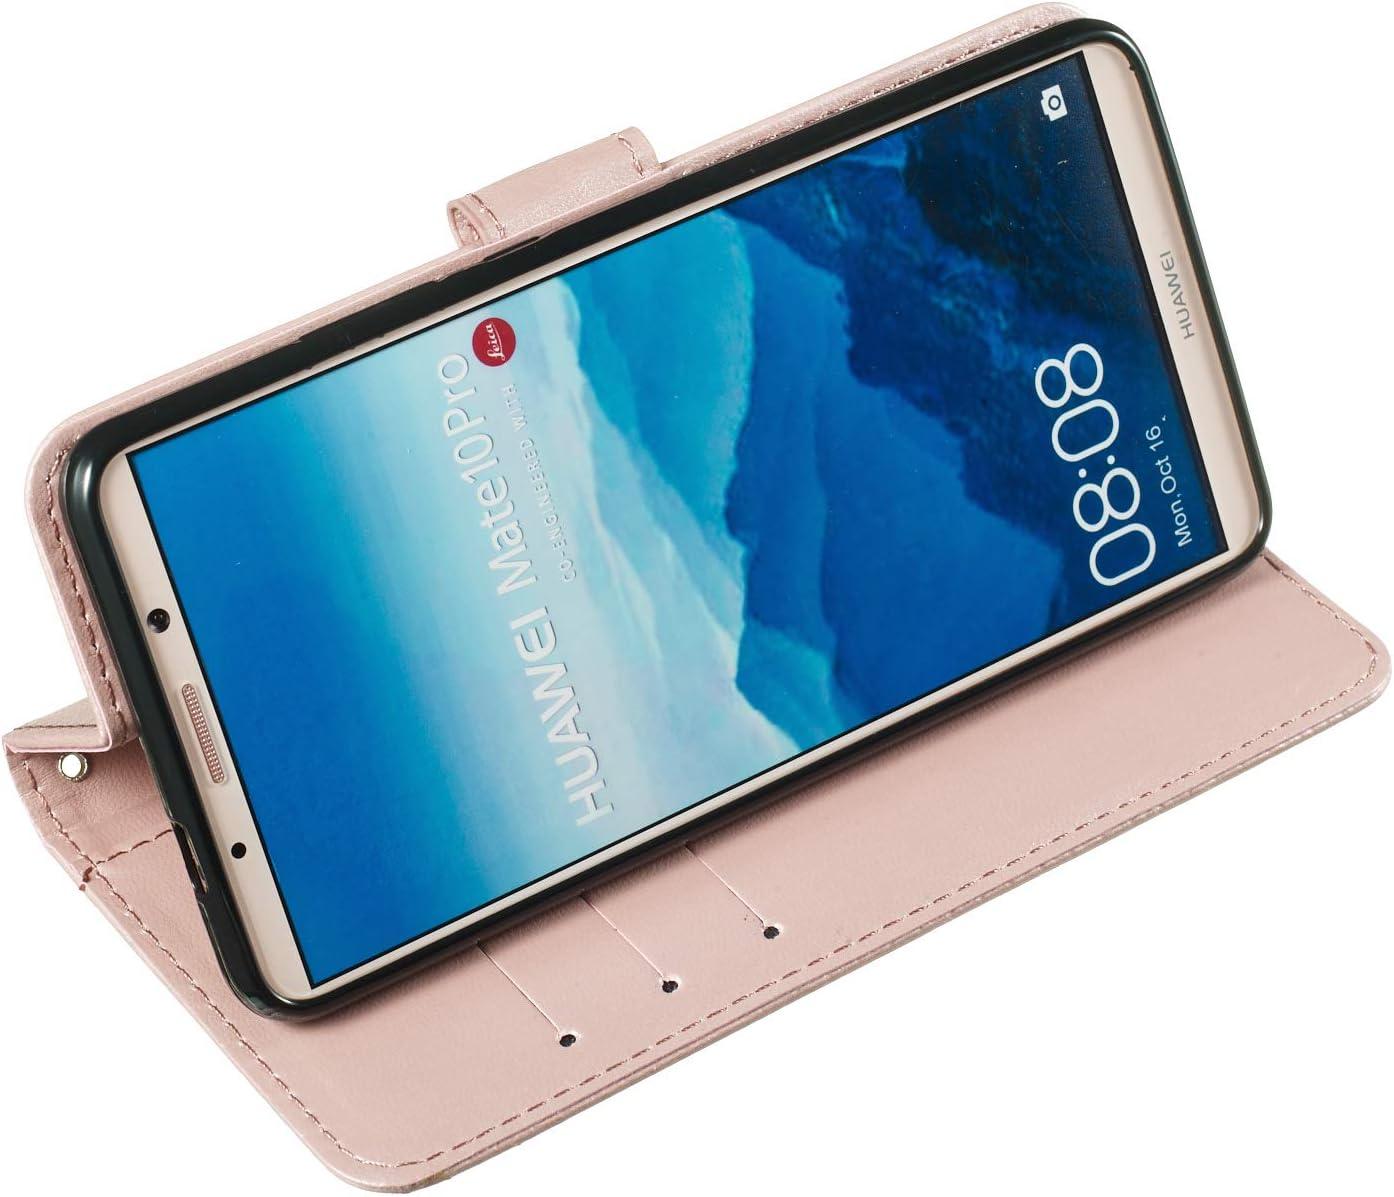 LOYHU250283 L3 Lomogo Huawei Mate 10 Pro Case Leather Wallet Case with Kickstand Card Holder Shockproof Flip Case Cover for Huawei Mate 10 Pro